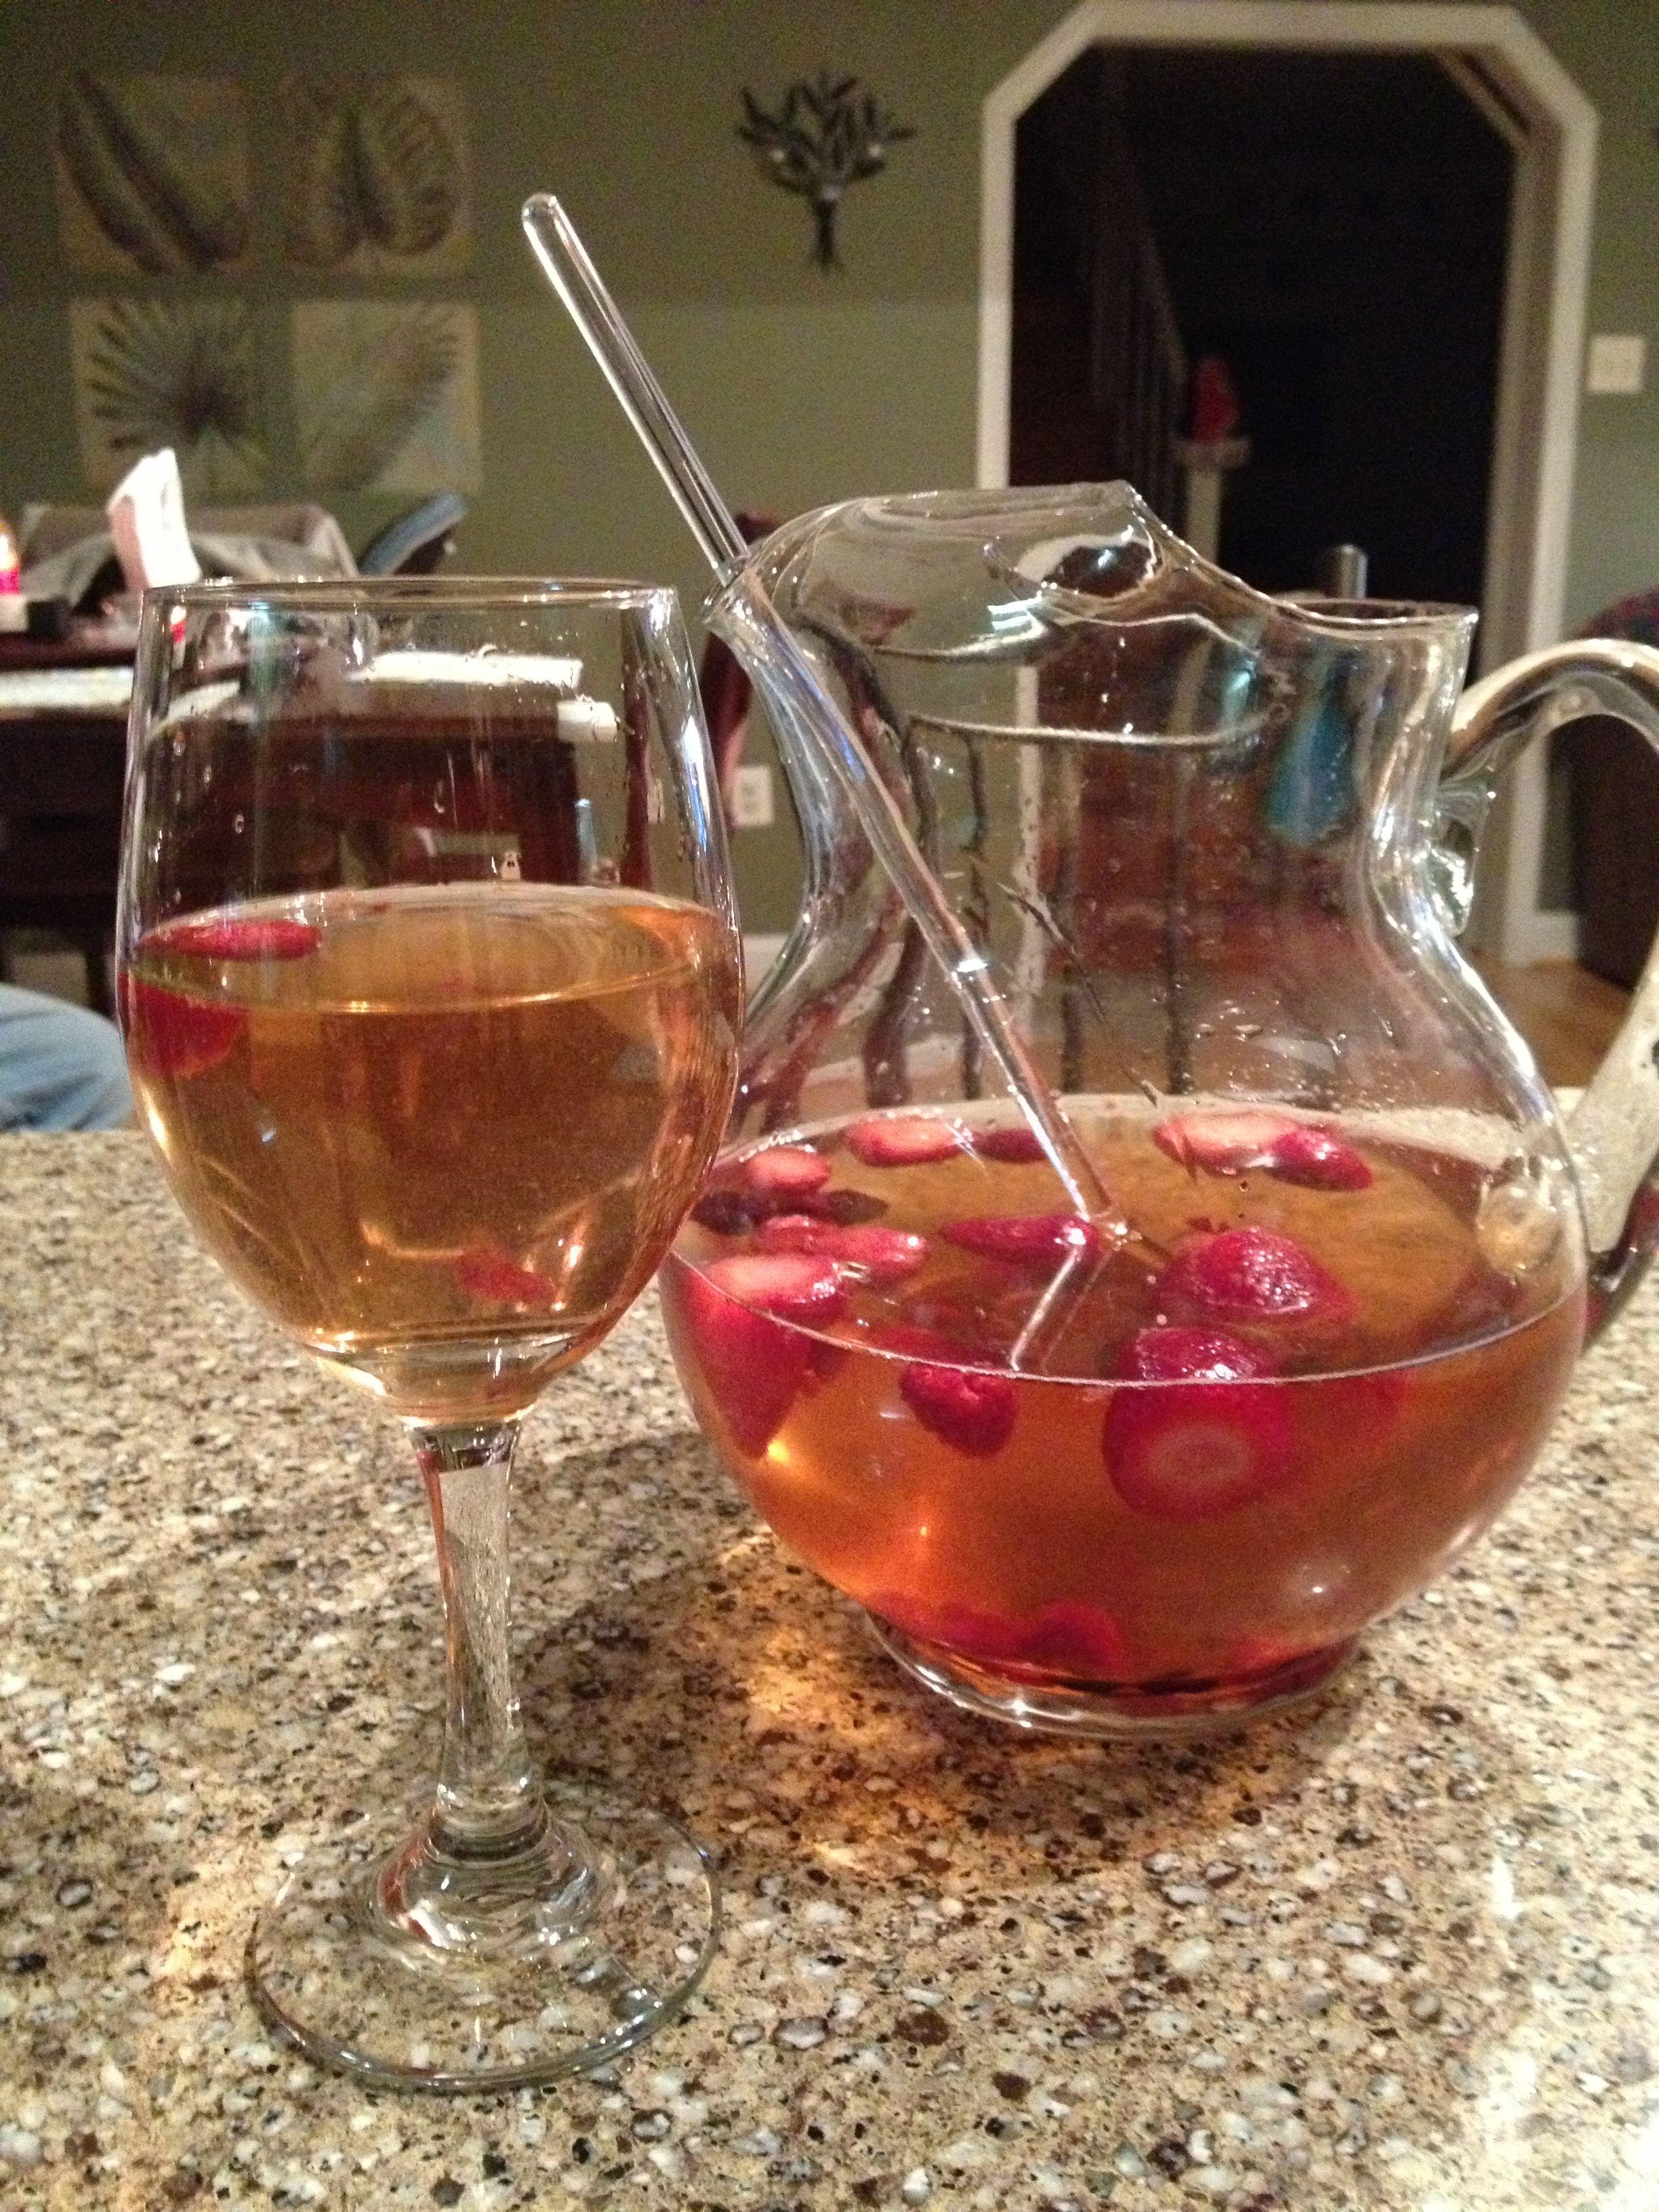 Ally S Sangria Barefoot Moscato Sprite Zero Peach Schnapps Mixed Berries Peach Wine Peach Schnapps Sprite Zero